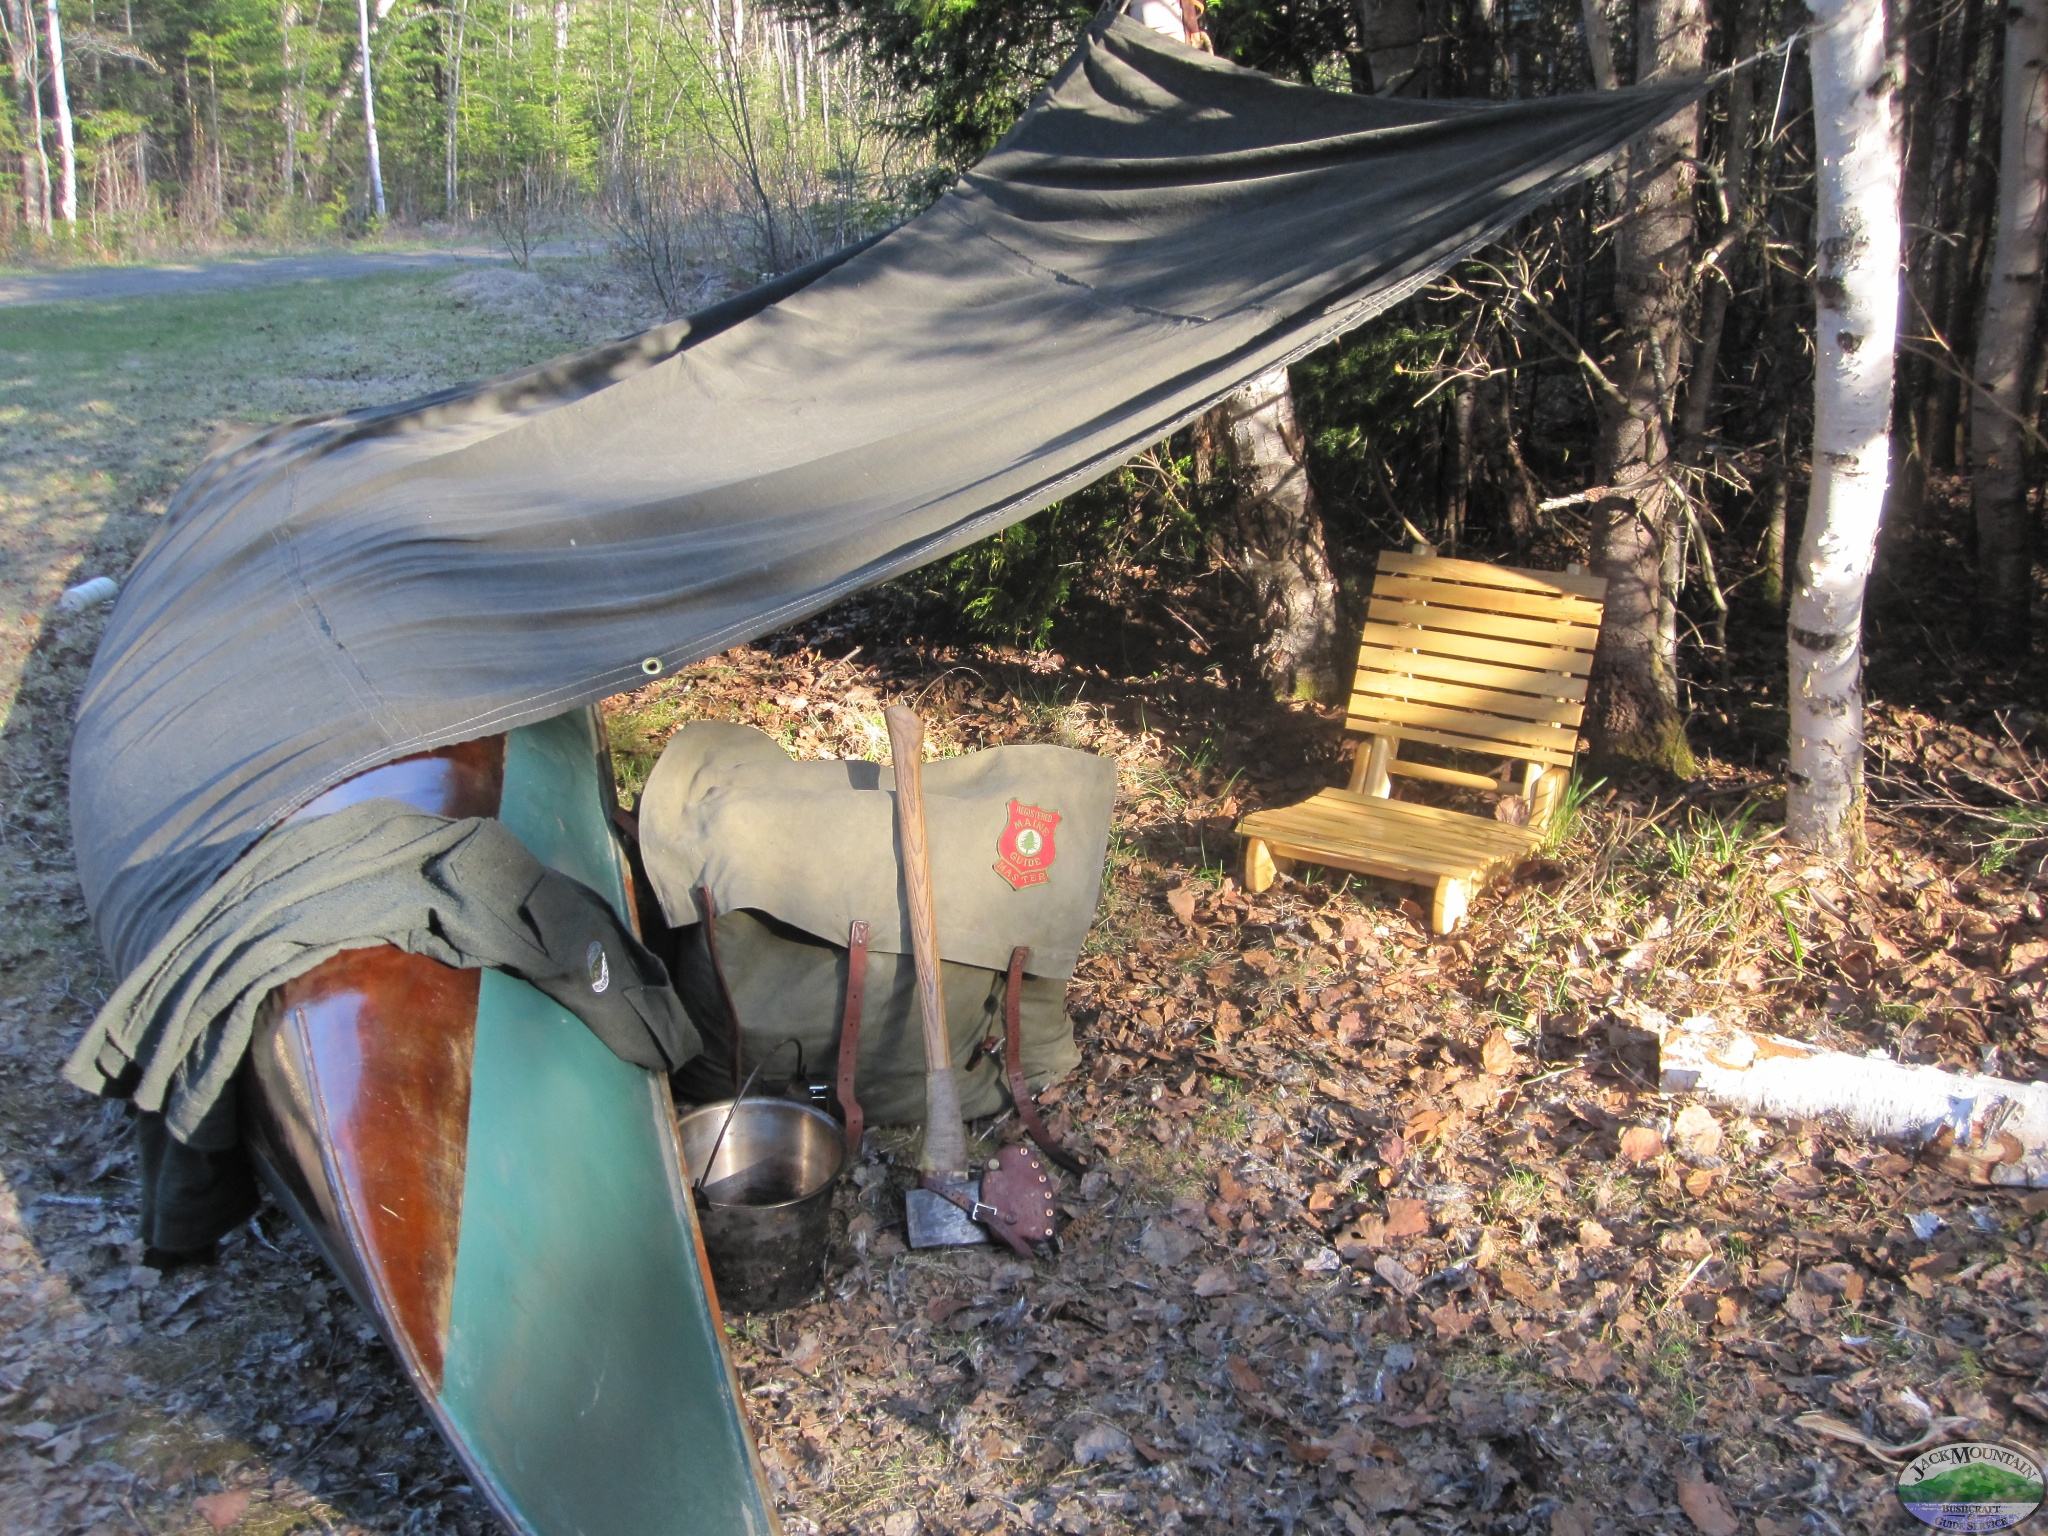 Traditional Canoe Shelter